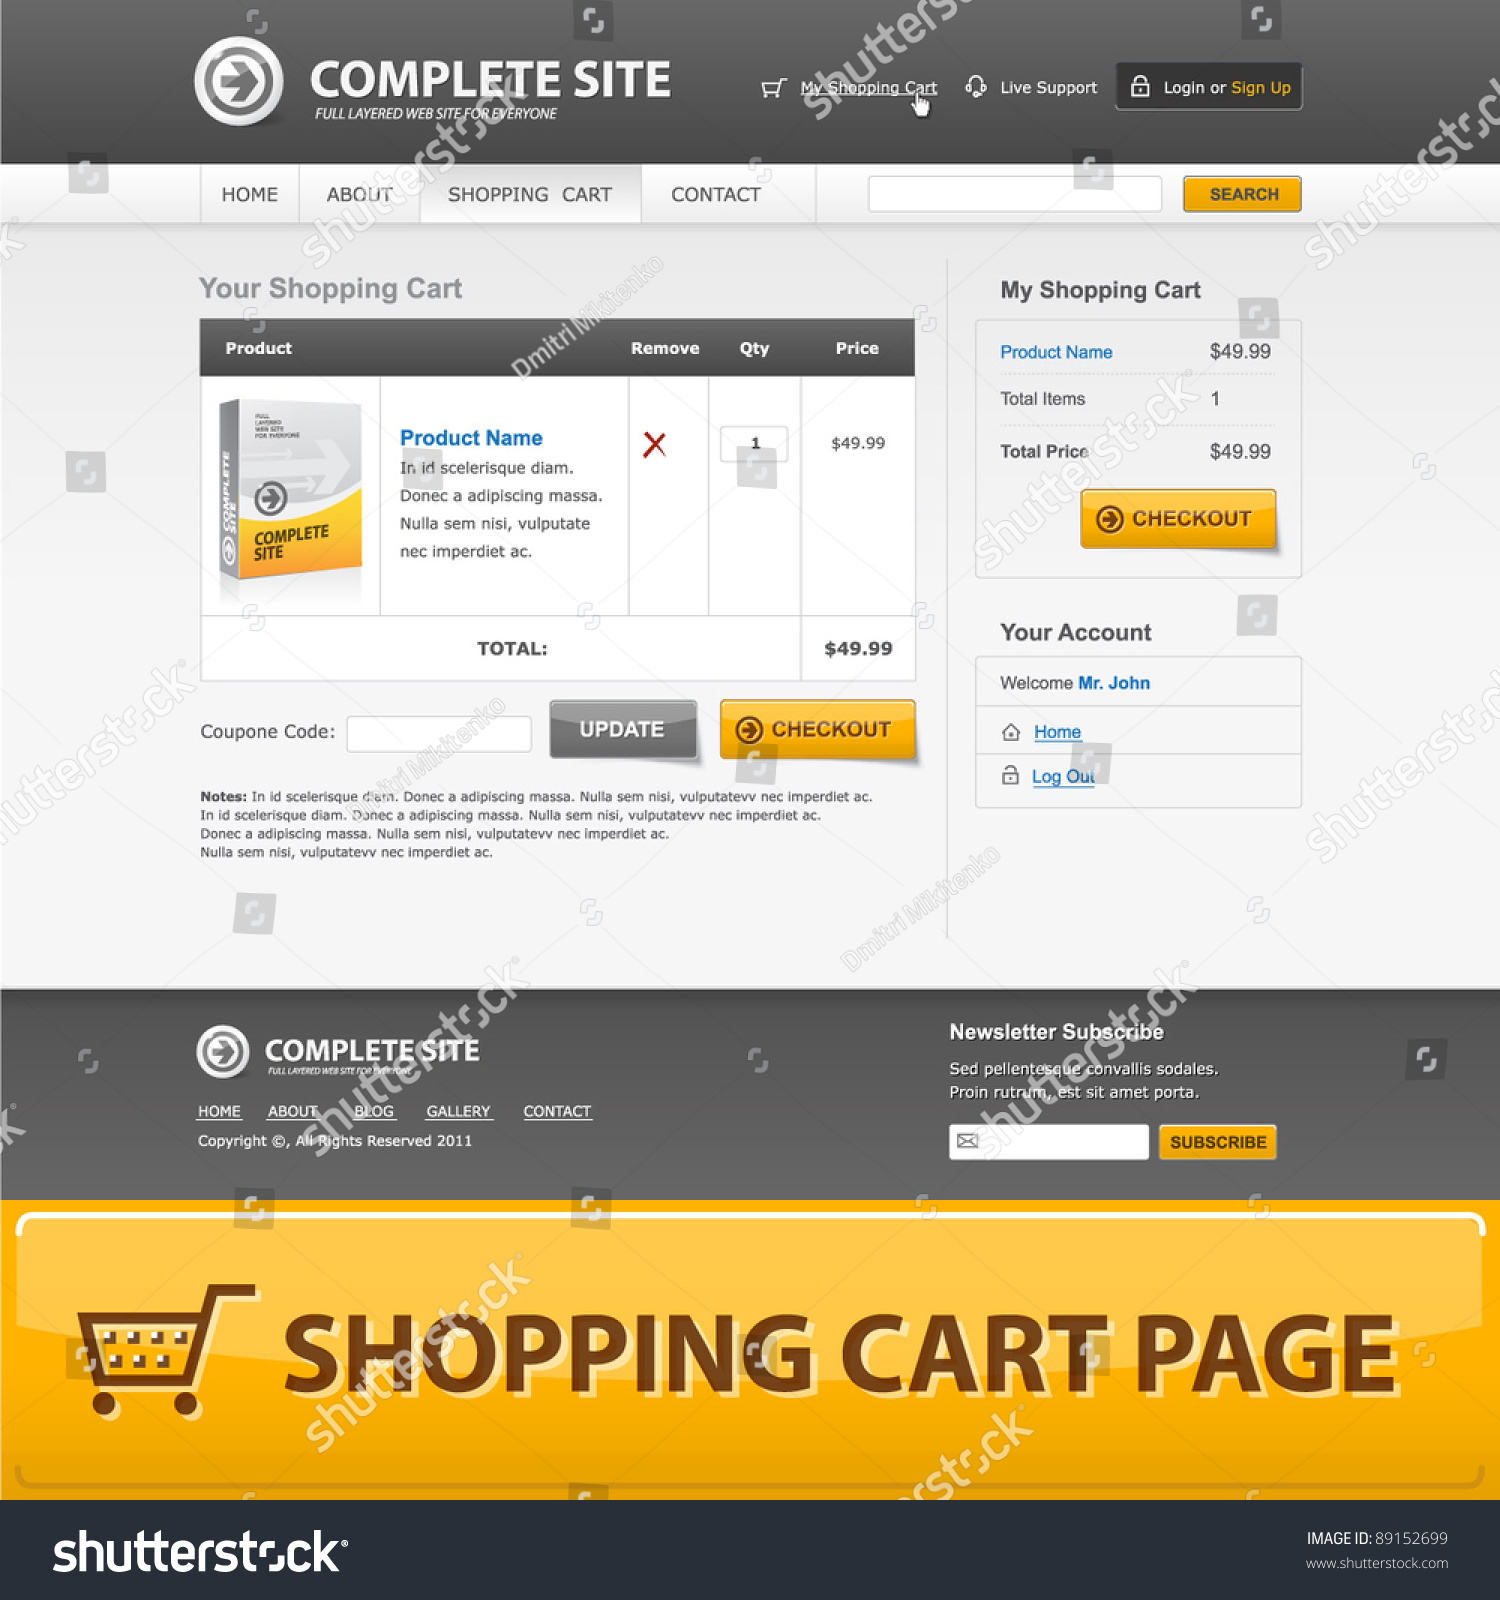 shopping cart website template driverlayer search engine. Black Bedroom Furniture Sets. Home Design Ideas